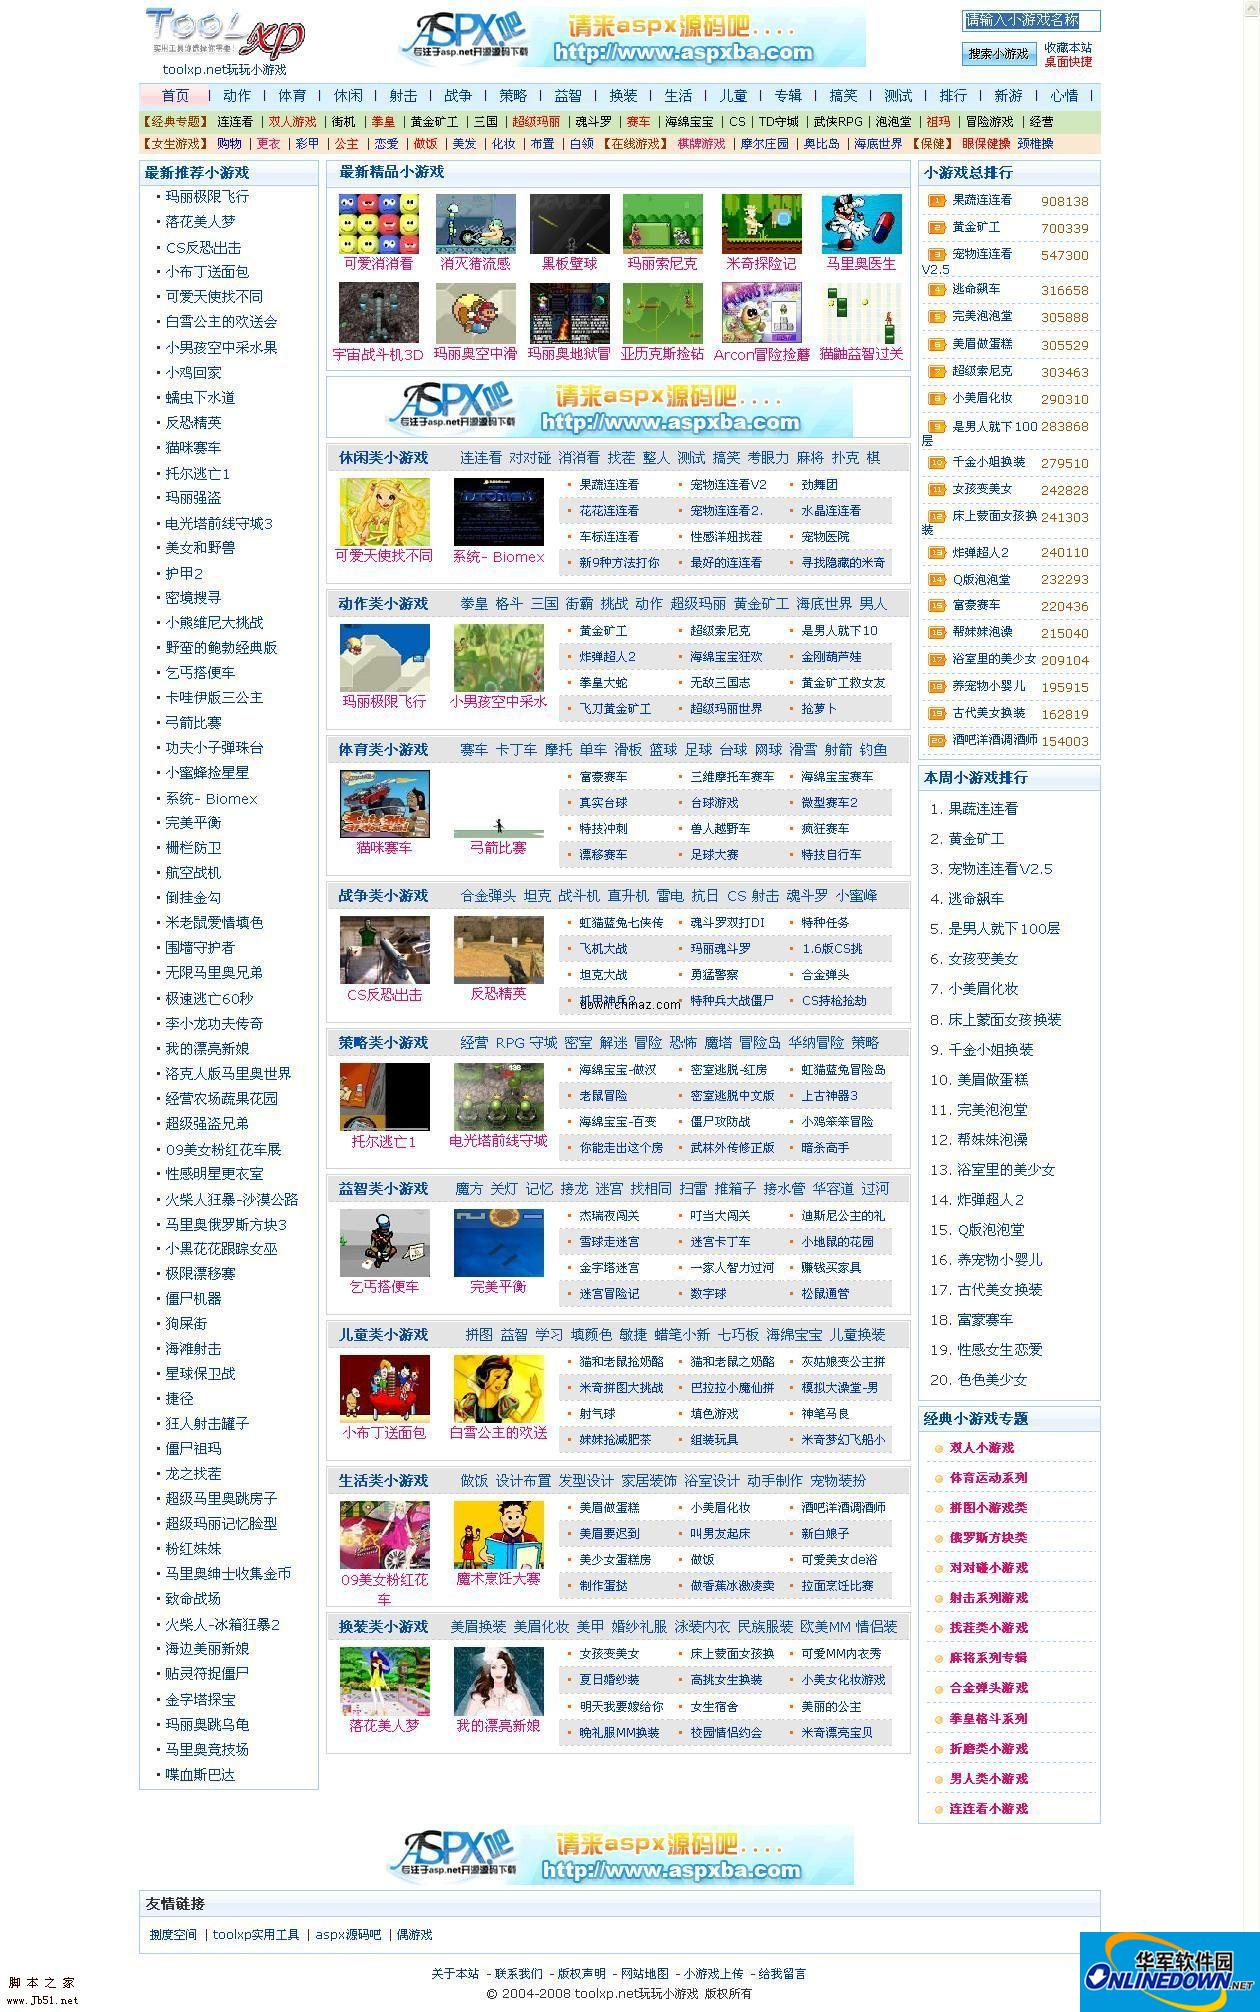 toolxp.net玩玩小游戏 .net2.0版 build 090706 PC版